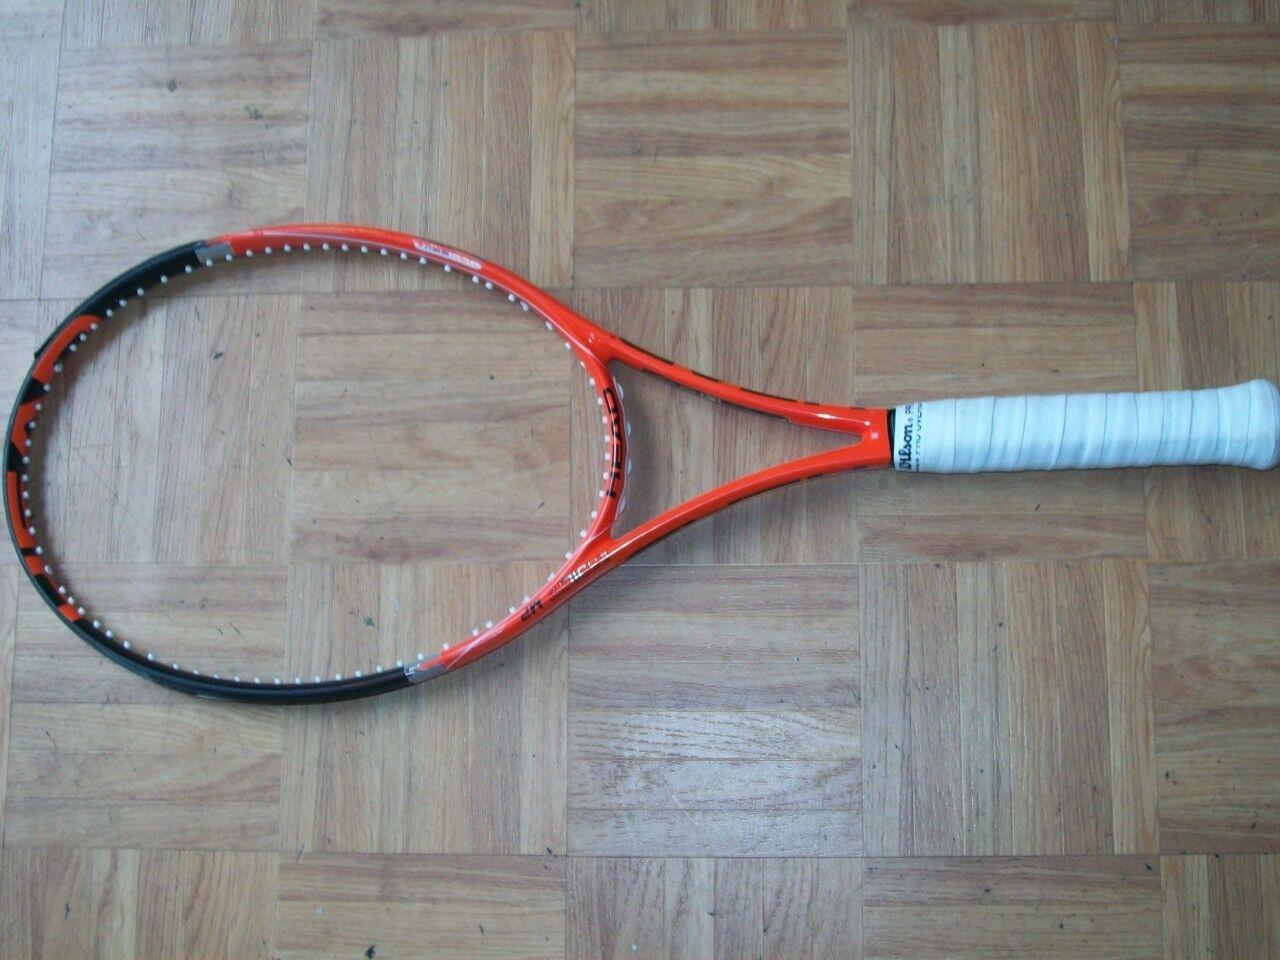 Cabeza Youtek Radical Midplus 98 cabeza 4 3 8 Grip Tenis Raqueta